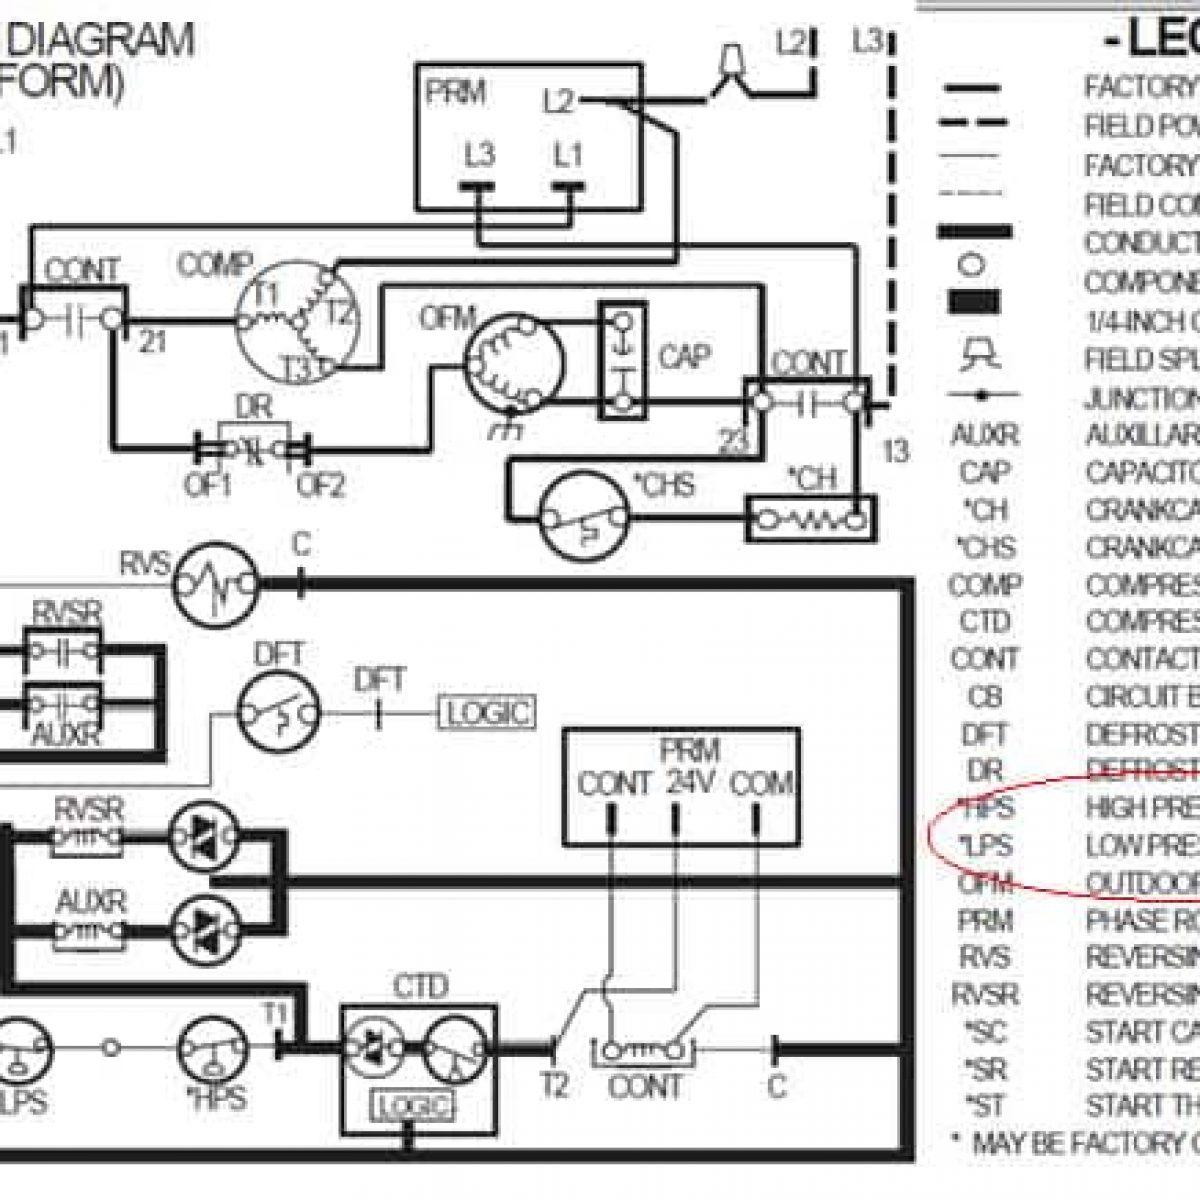 Ac Condensate Pump Wiring Diagram